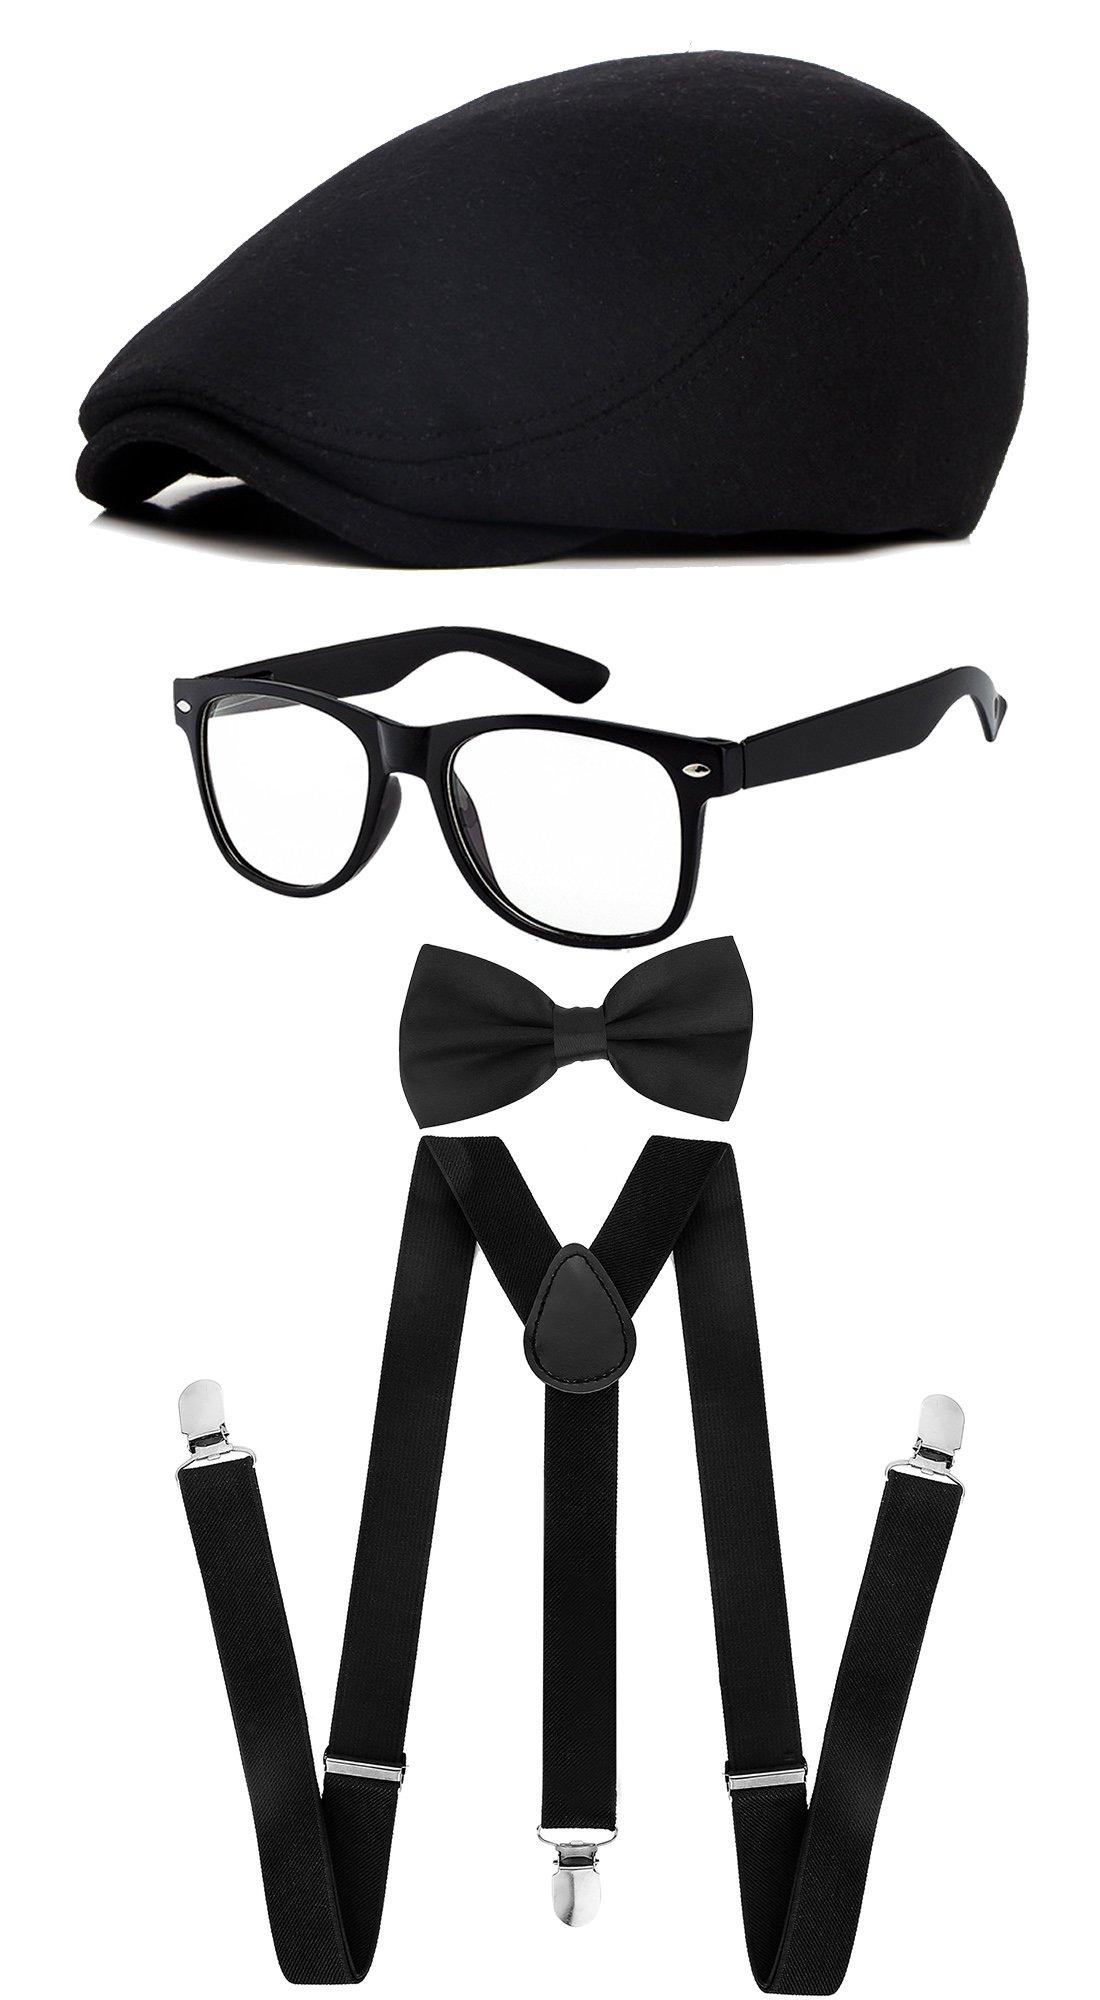 Classic Gatsby Newsboy Ivy Hat,Suspenders Y-Back Trouser Braces,Pre Tied Bow Tie,Non Prescription Glasses (Cotton - Black)